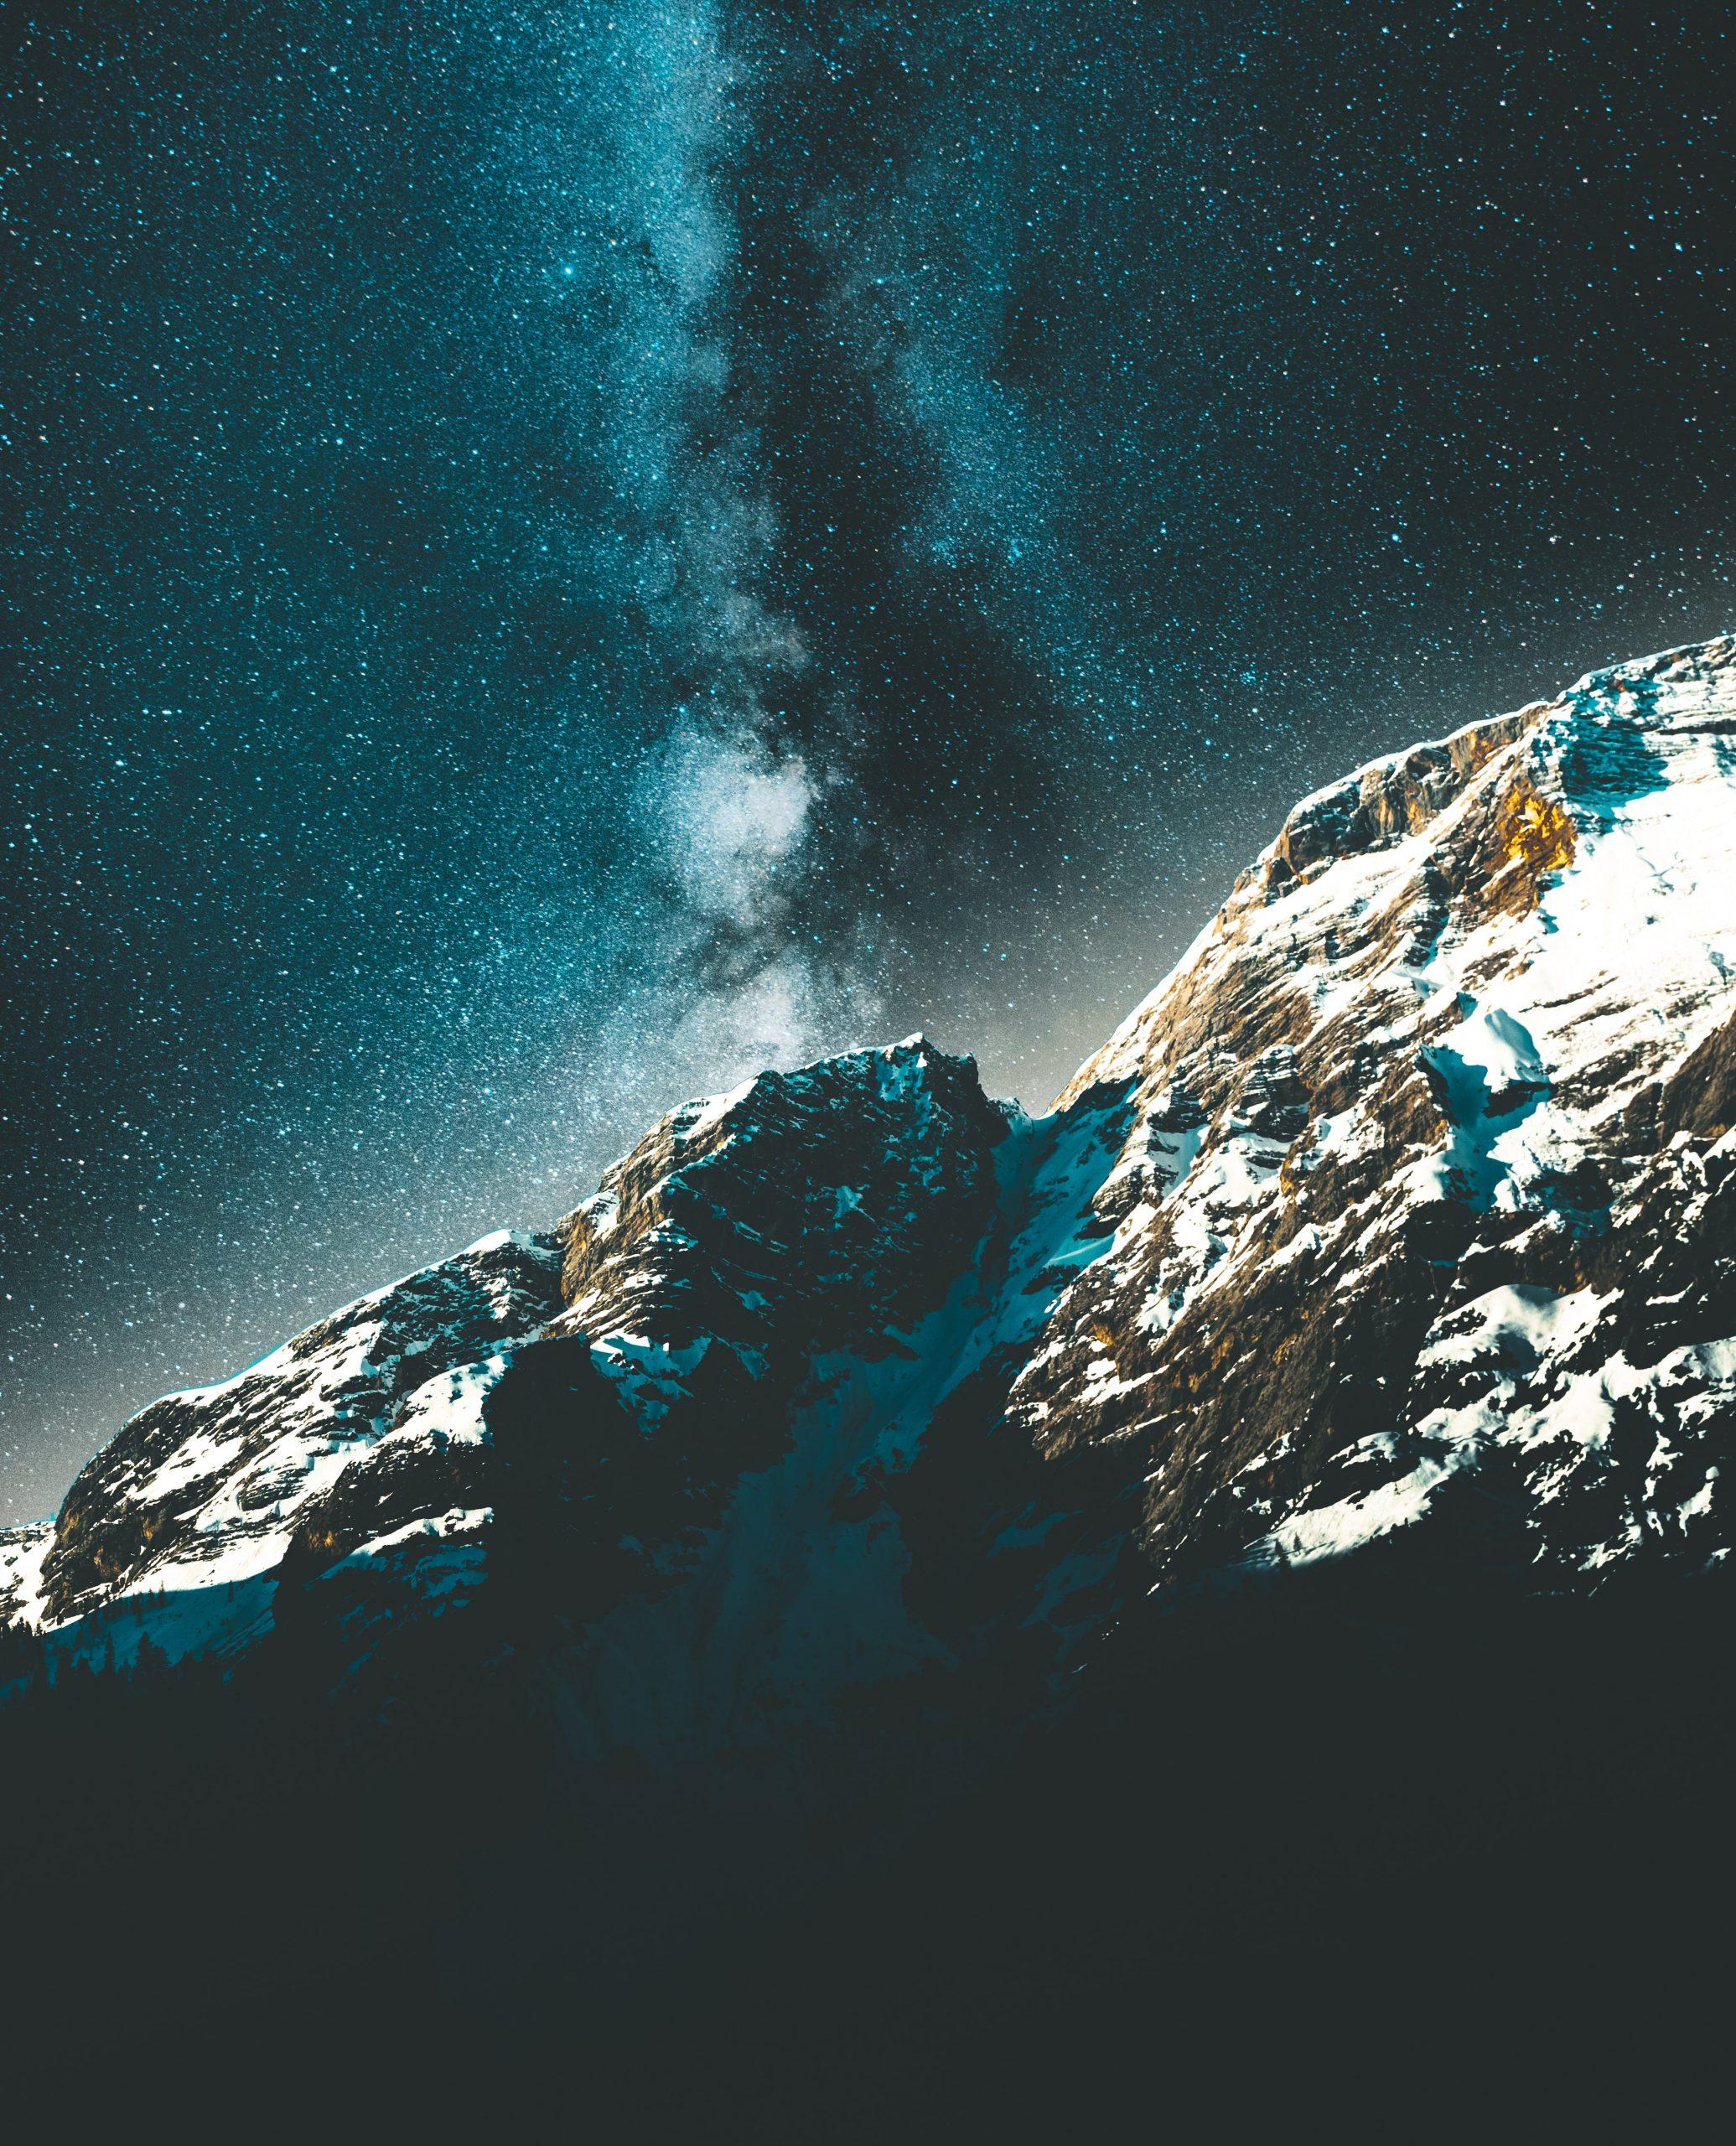 "<span>Photo by <a href=""https://unsplash.com/@joshuafuller?utm_source=unsplash&utm_medium=referral&utm_content=creditCopyText"">Joshua Fuller</a> on <a href=""https://unsplash.com/s/photos/planet-earth?utm_source=unsplash&utm_medium=referral&utm_content=creditCopyText"">Unsplash</a></span>"